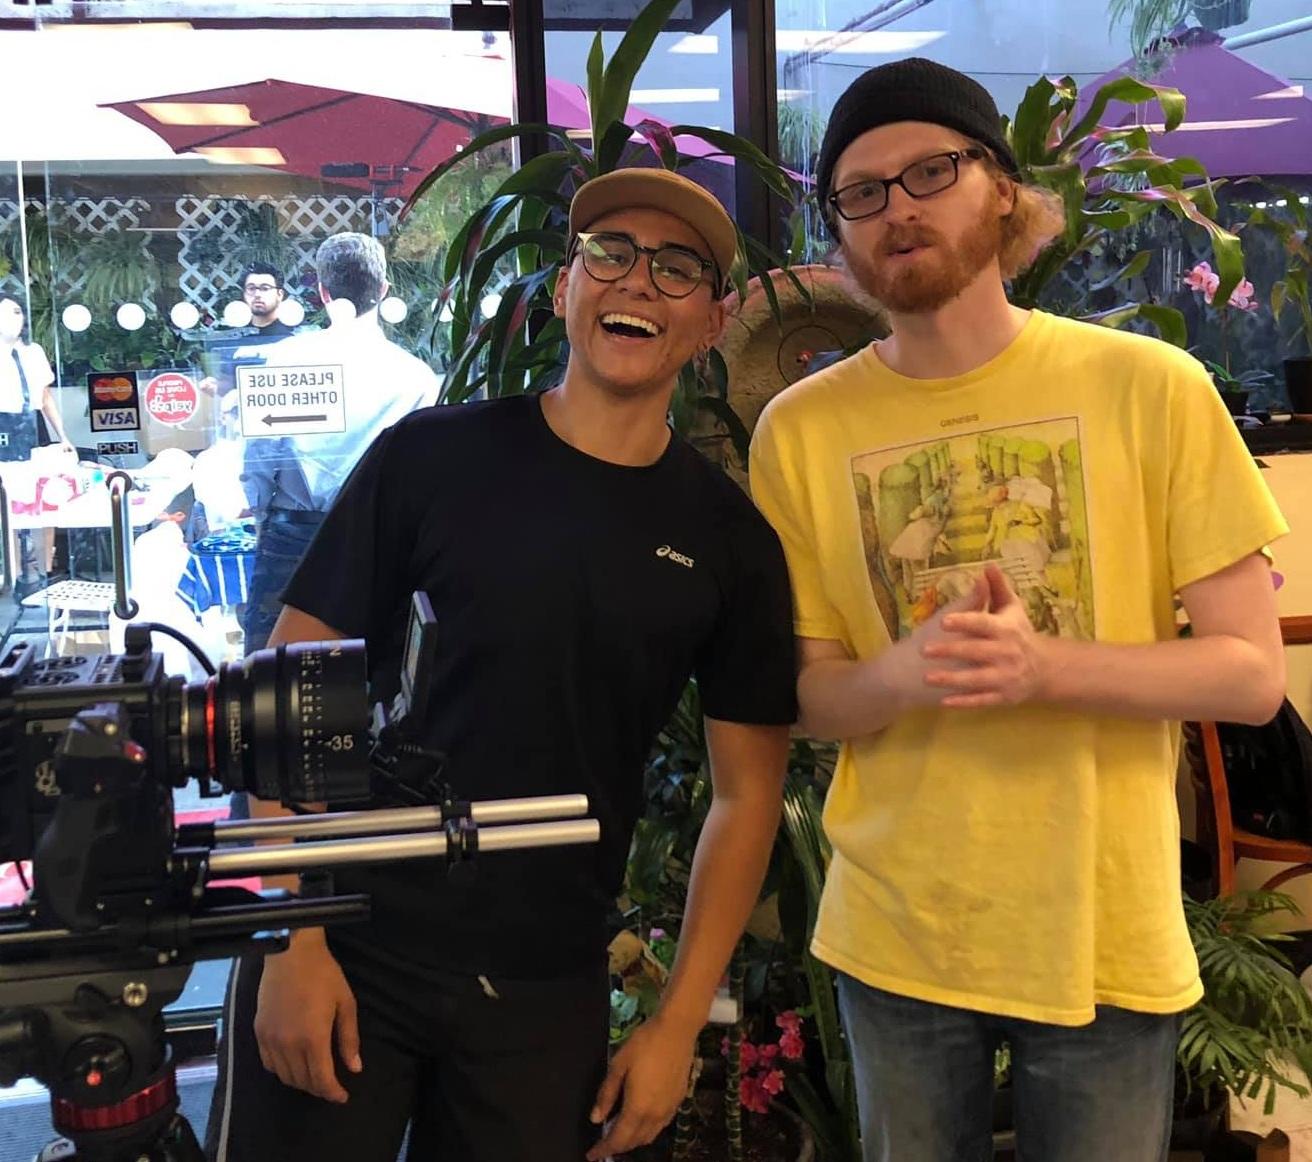 Director Landon Coats and Avery Ramirez Director of Photography